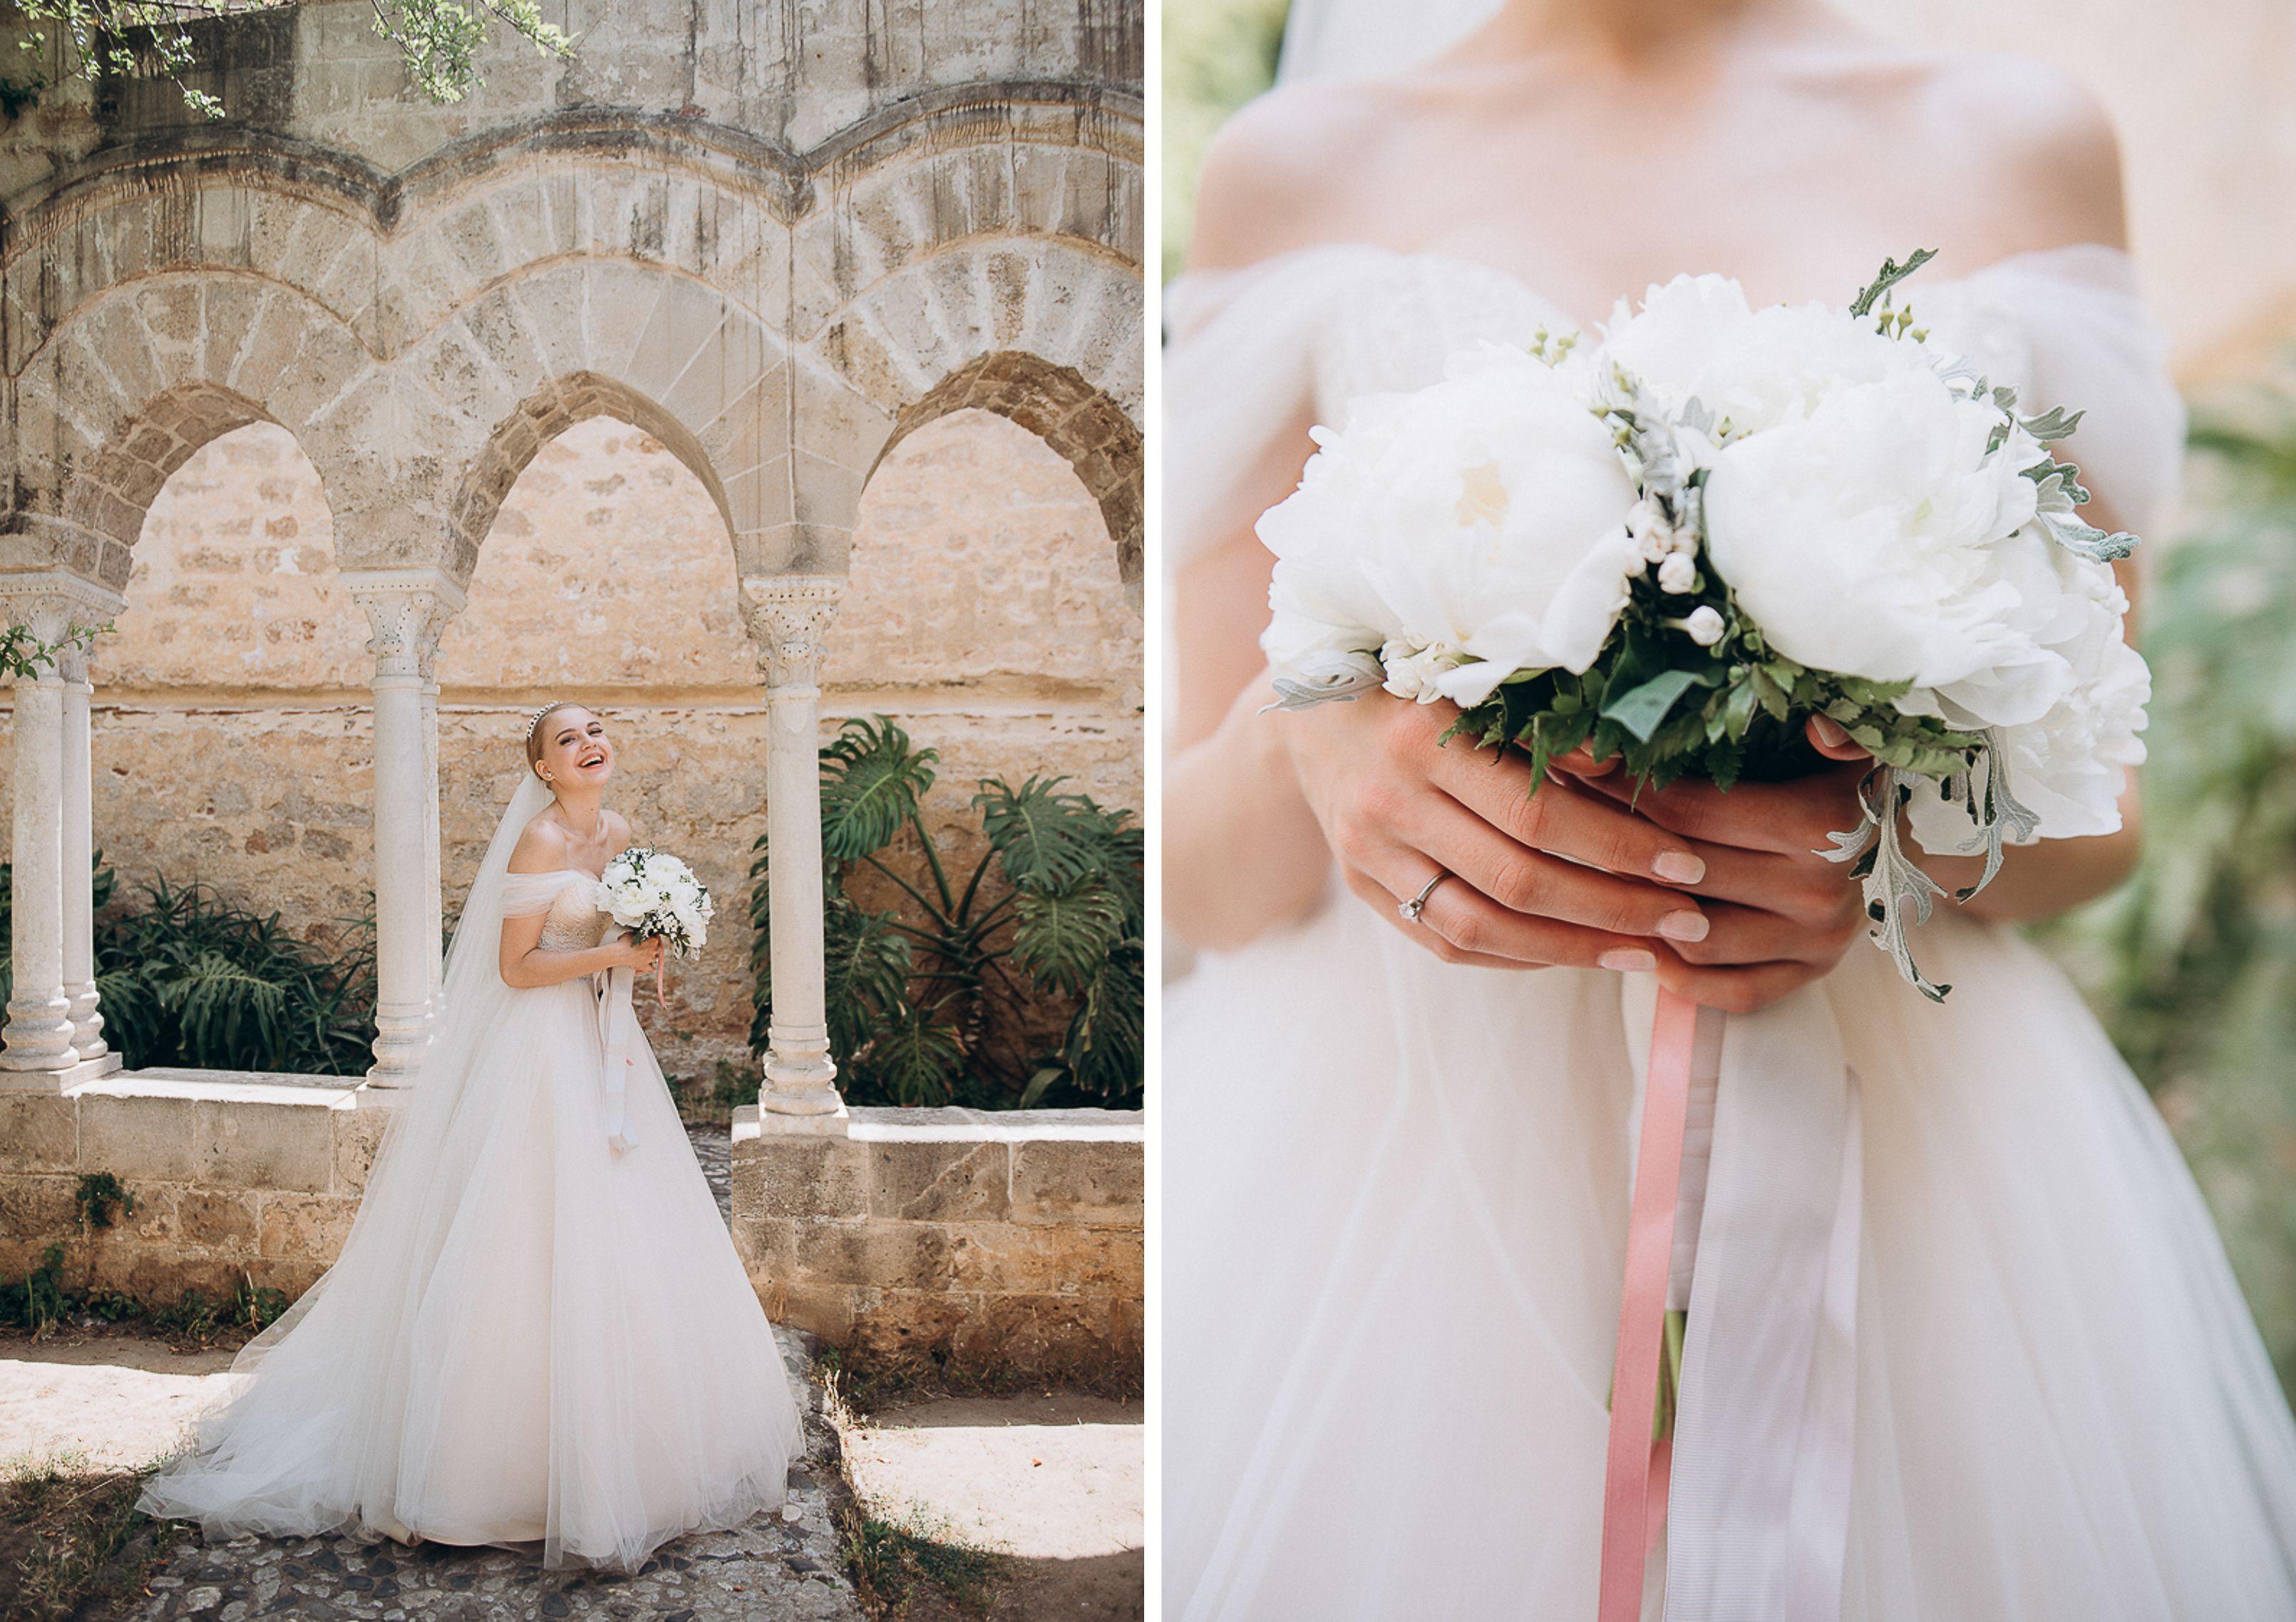 Wedding In Palermo Elopement In Sicily Wedding Photographer Sicily Sicily Wedding Italy Wedding Wedding Photographers